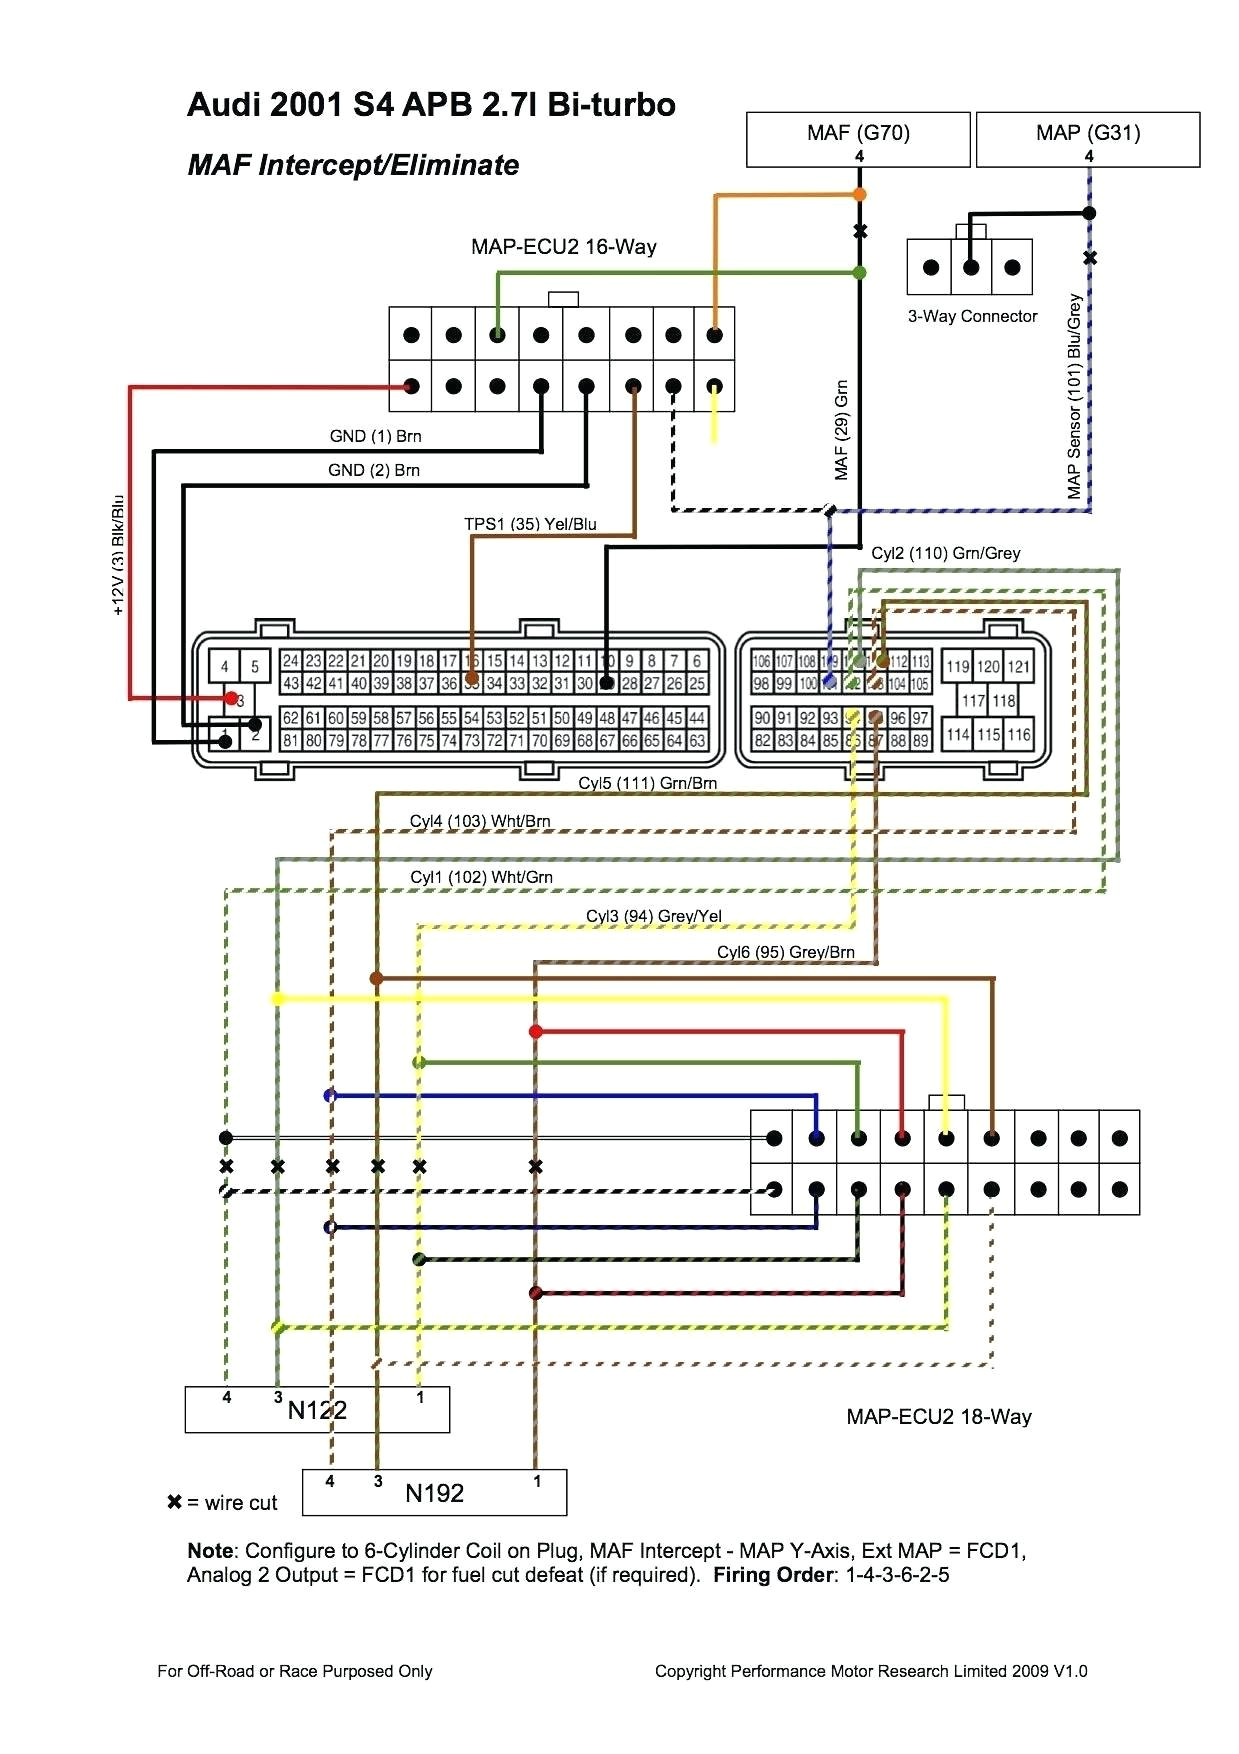 wiring diagram 99 dodge ram wiring diagram centre 2002 dodge ram 1500 trailer wiring diagram 2002 dodge ram 1500 wiring diagram